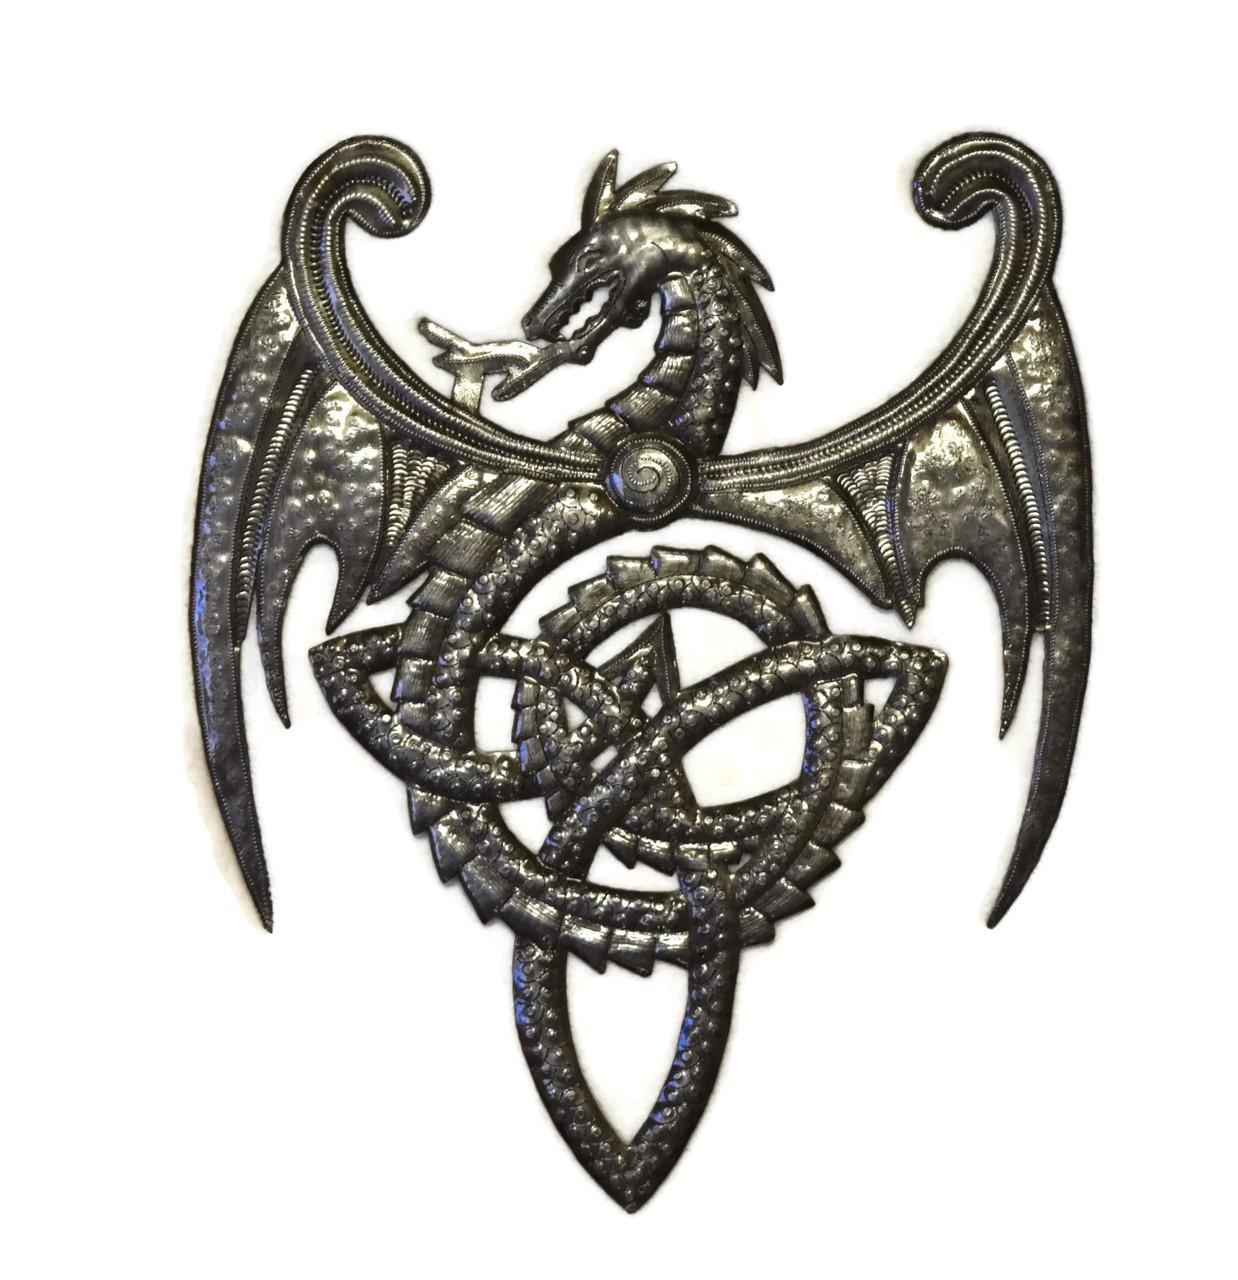 Celtic Wall Art metal dragon wall artwork, celtic knot symbol, haitian metal art